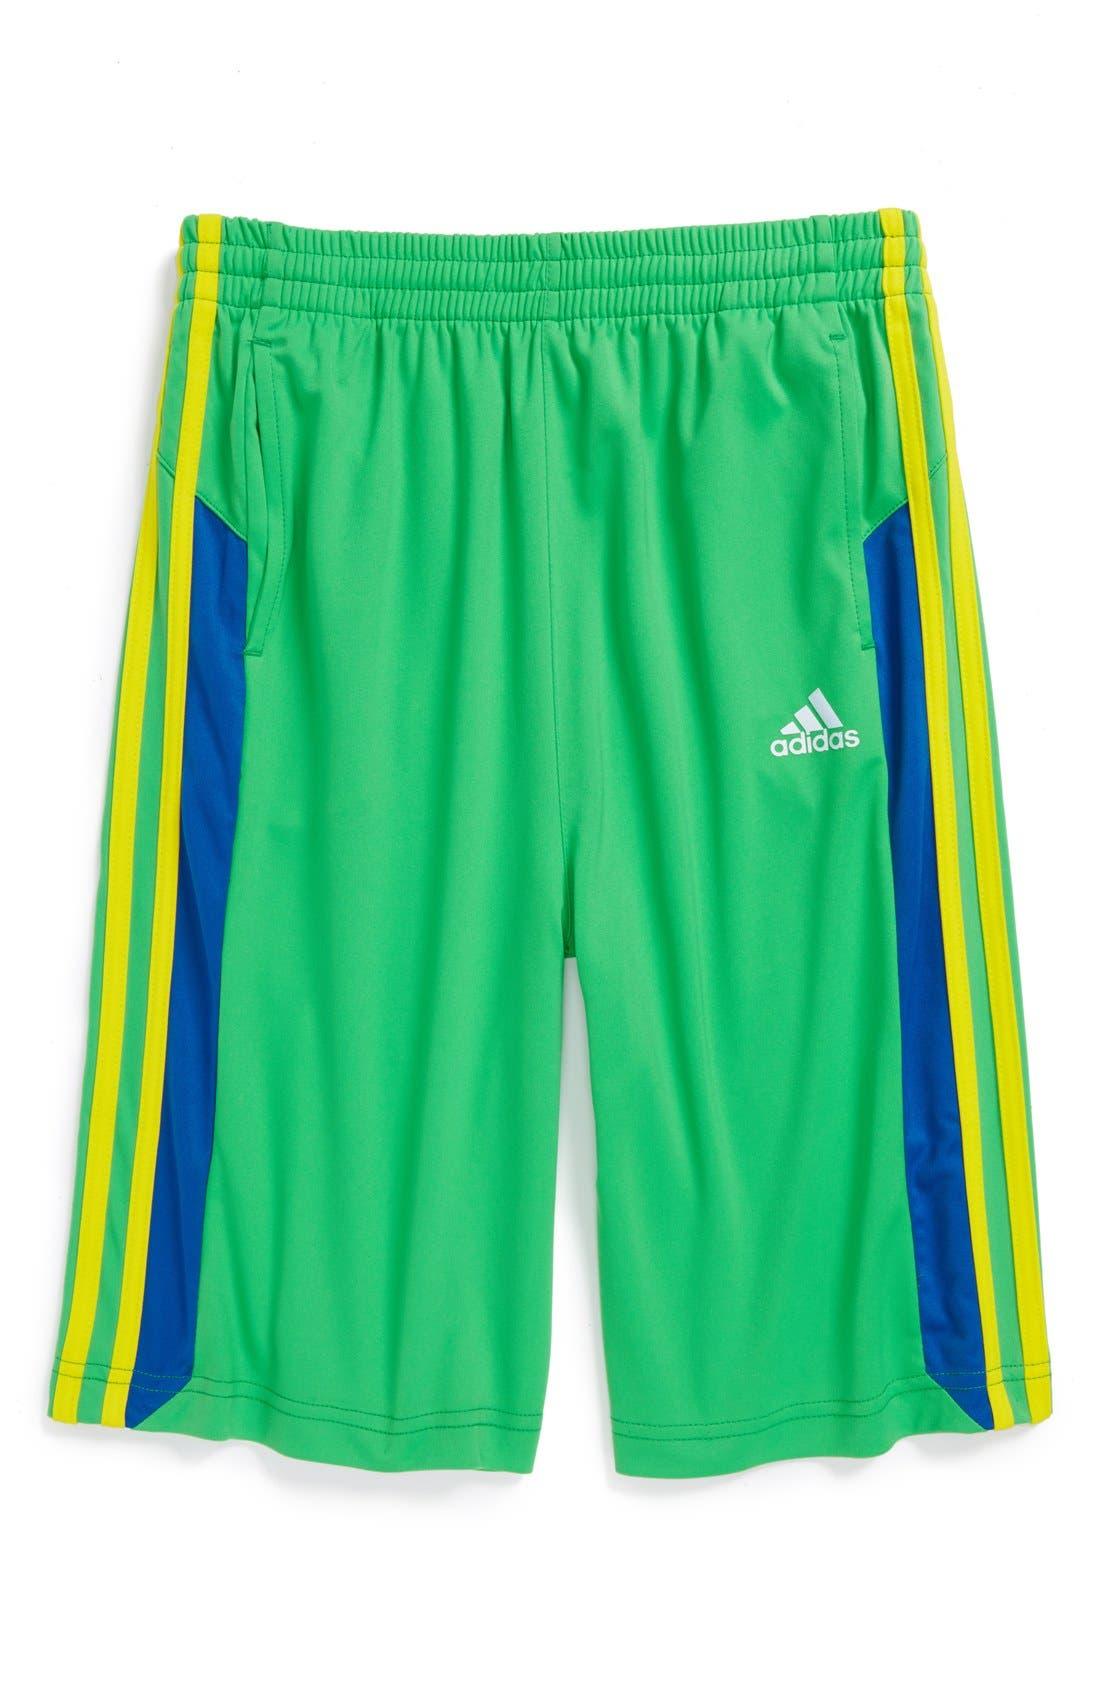 Alternate Image 1 Selected - adidas 'Global' Shorts (Big Boys)